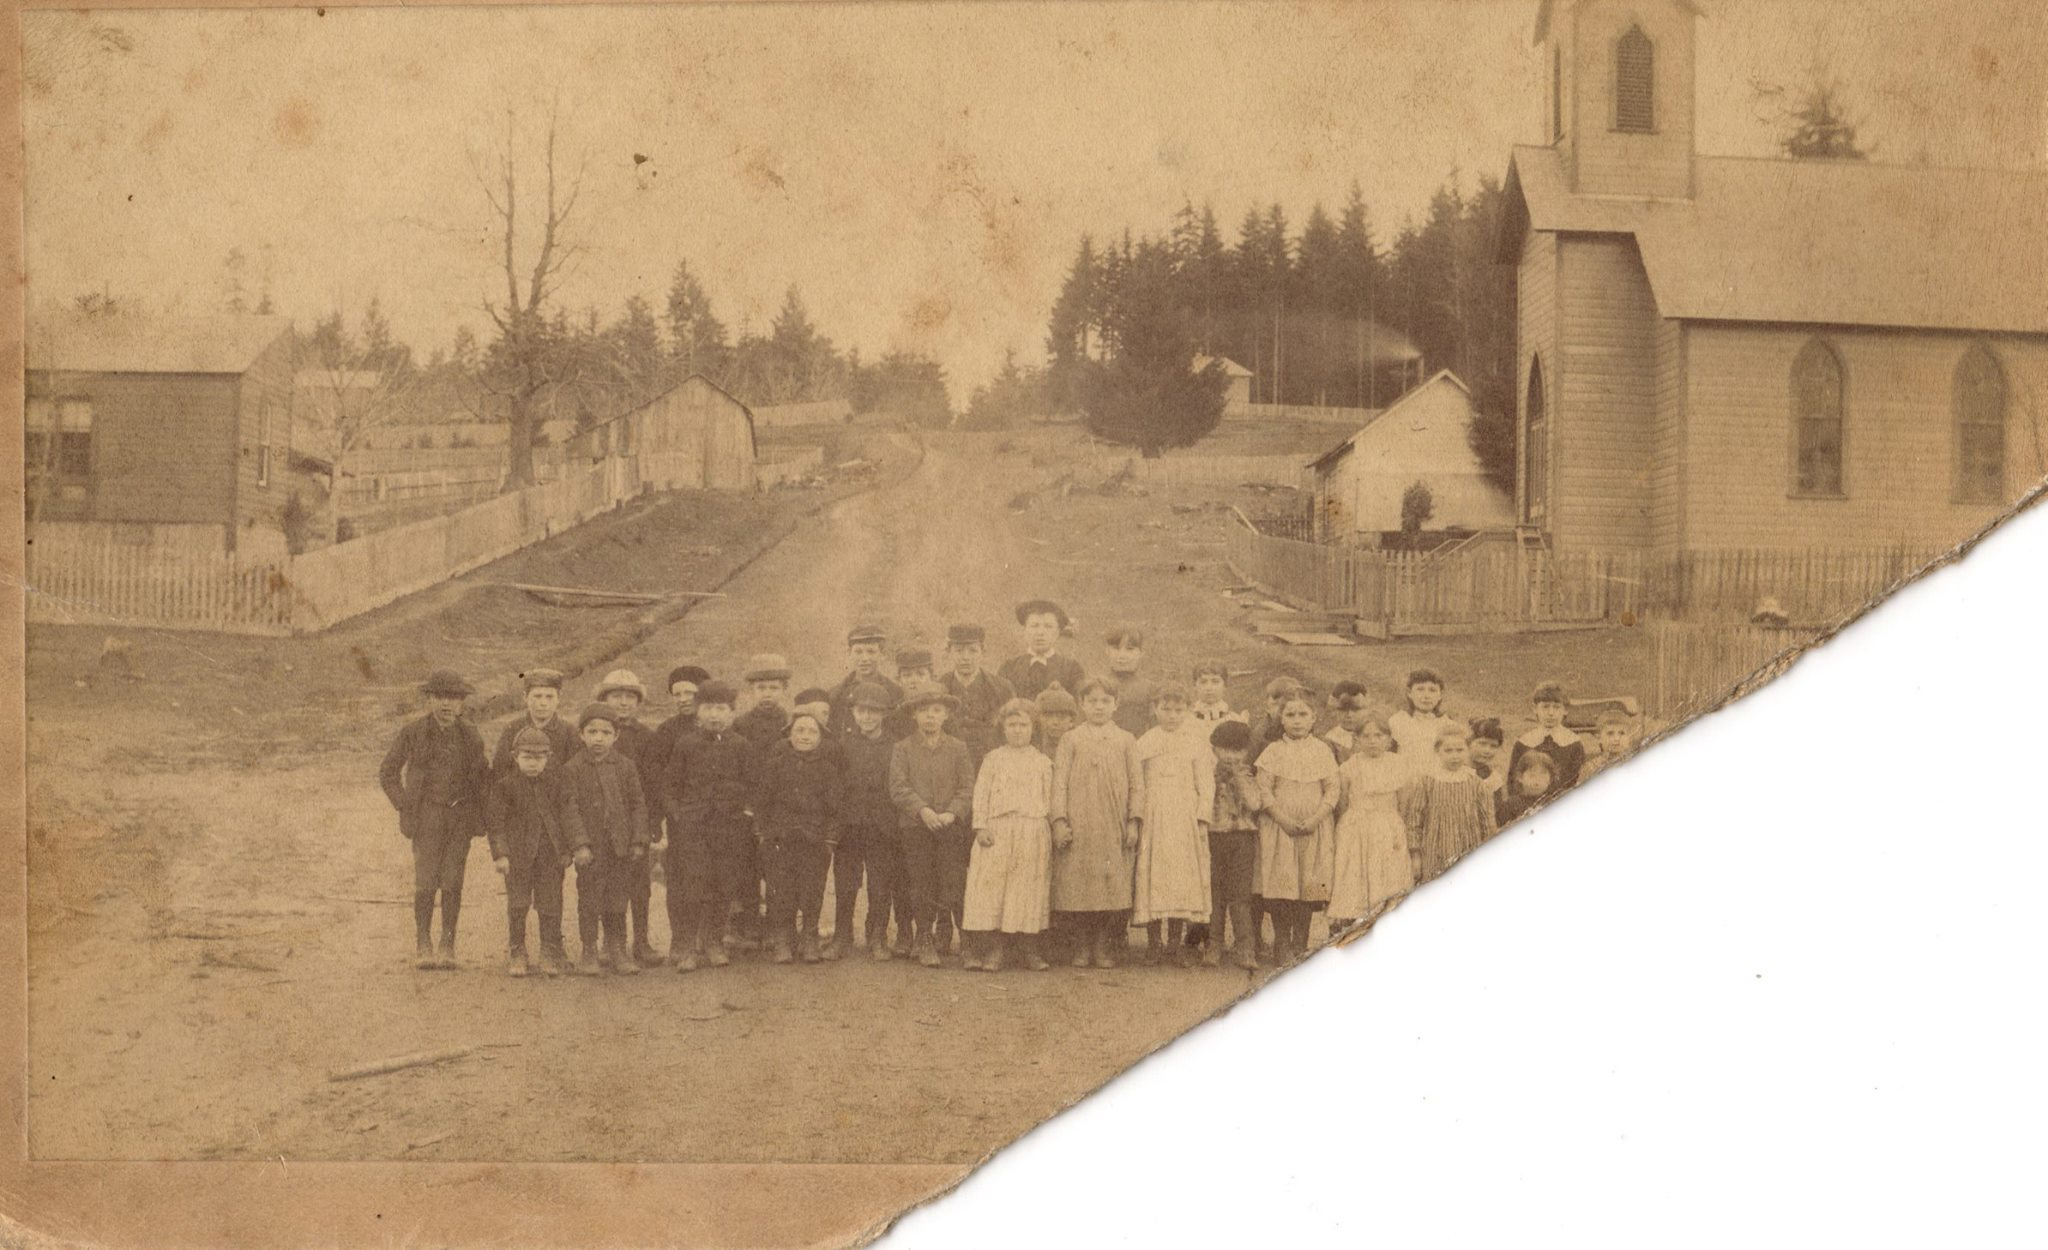 1890 School Children on the foot of John Ave.